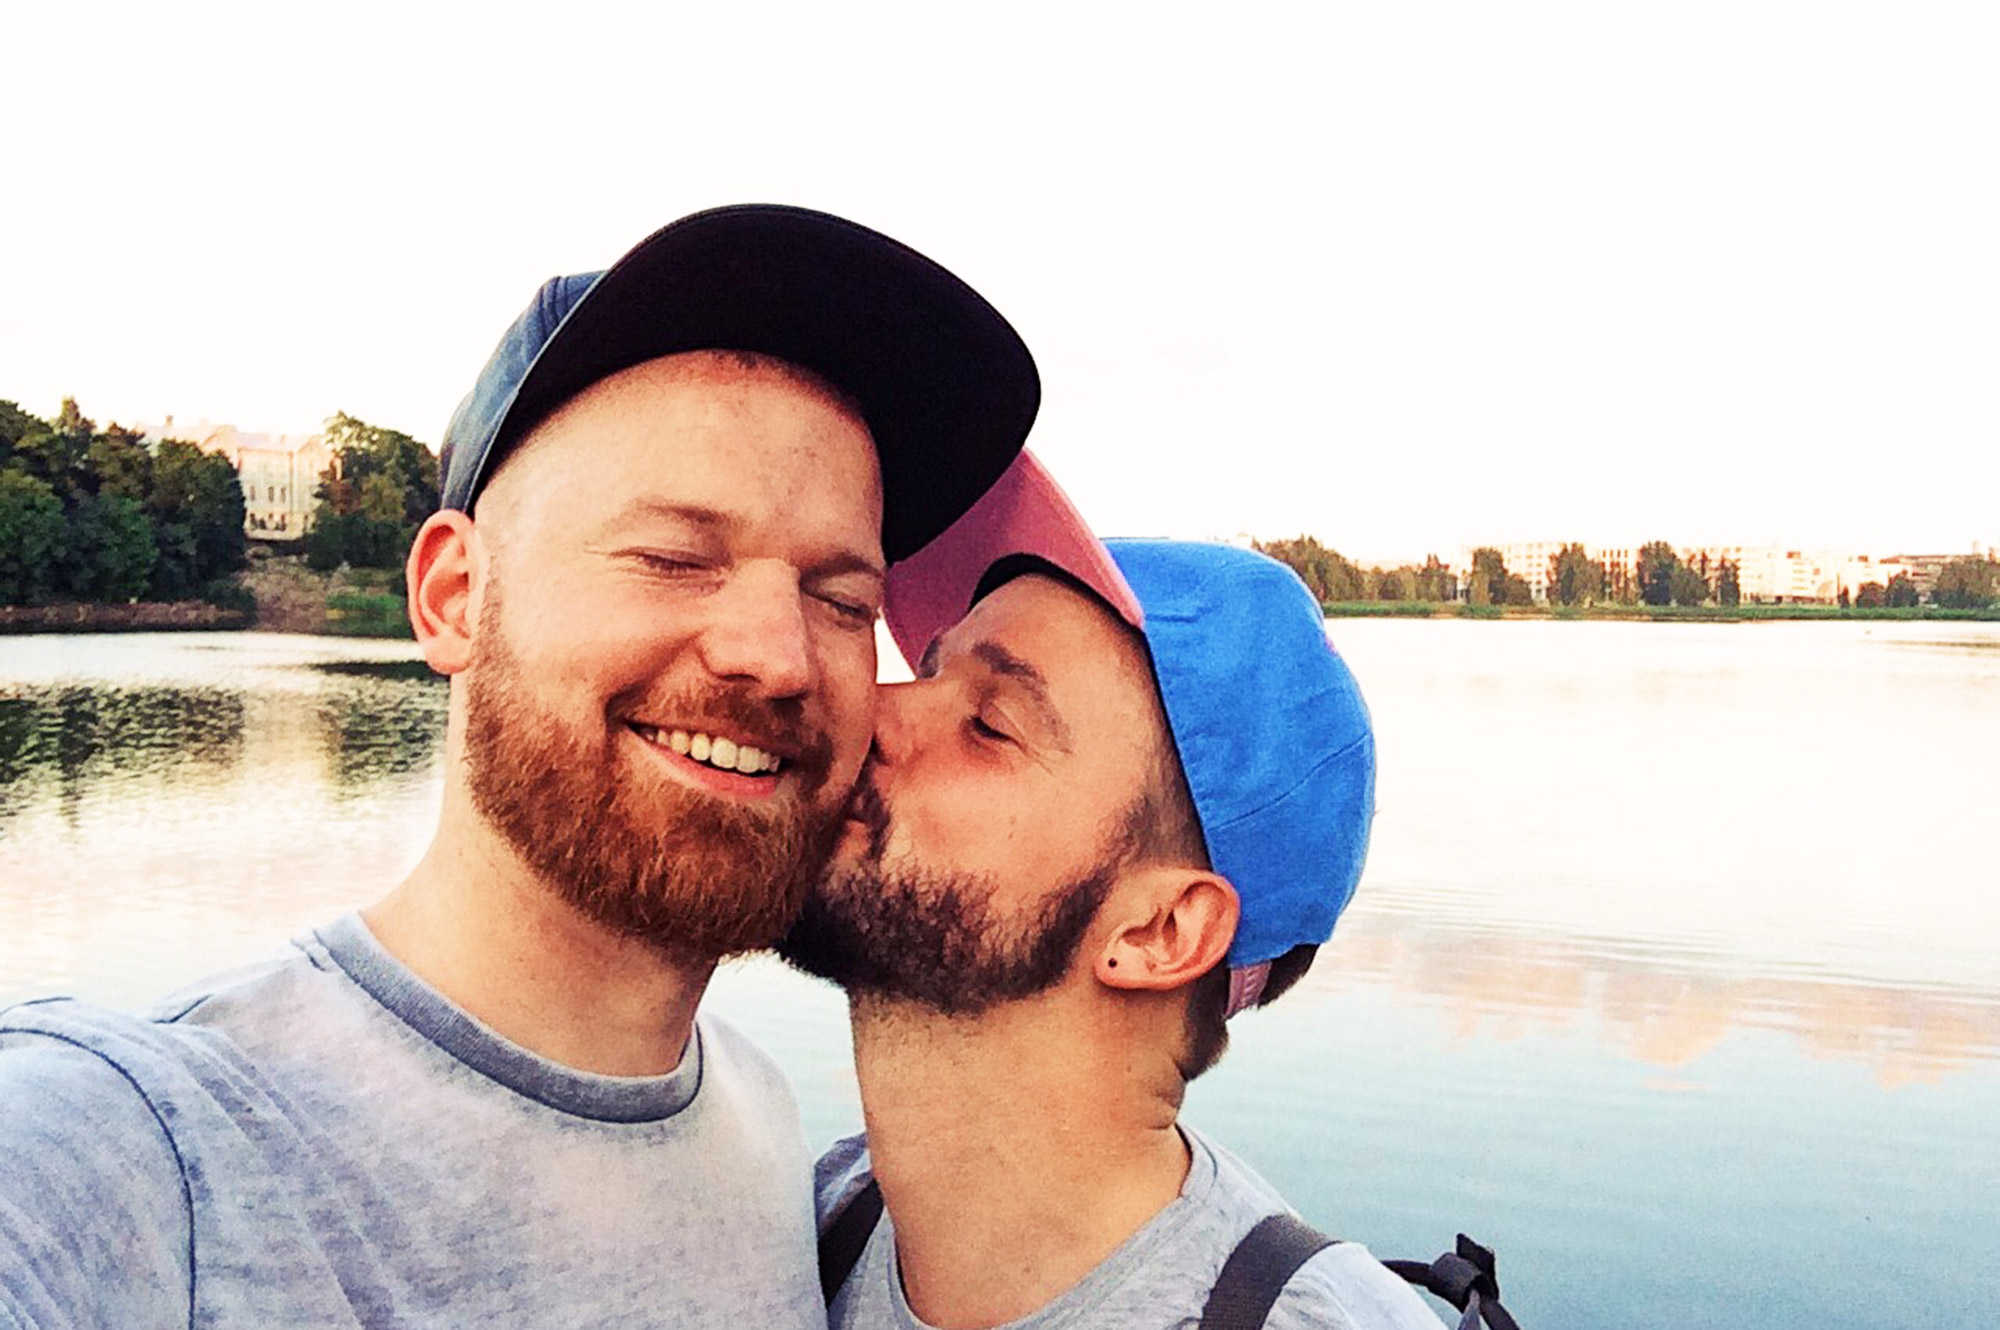 Valentine's Day Gay Kisses #lovewins © CoupleofMen.com